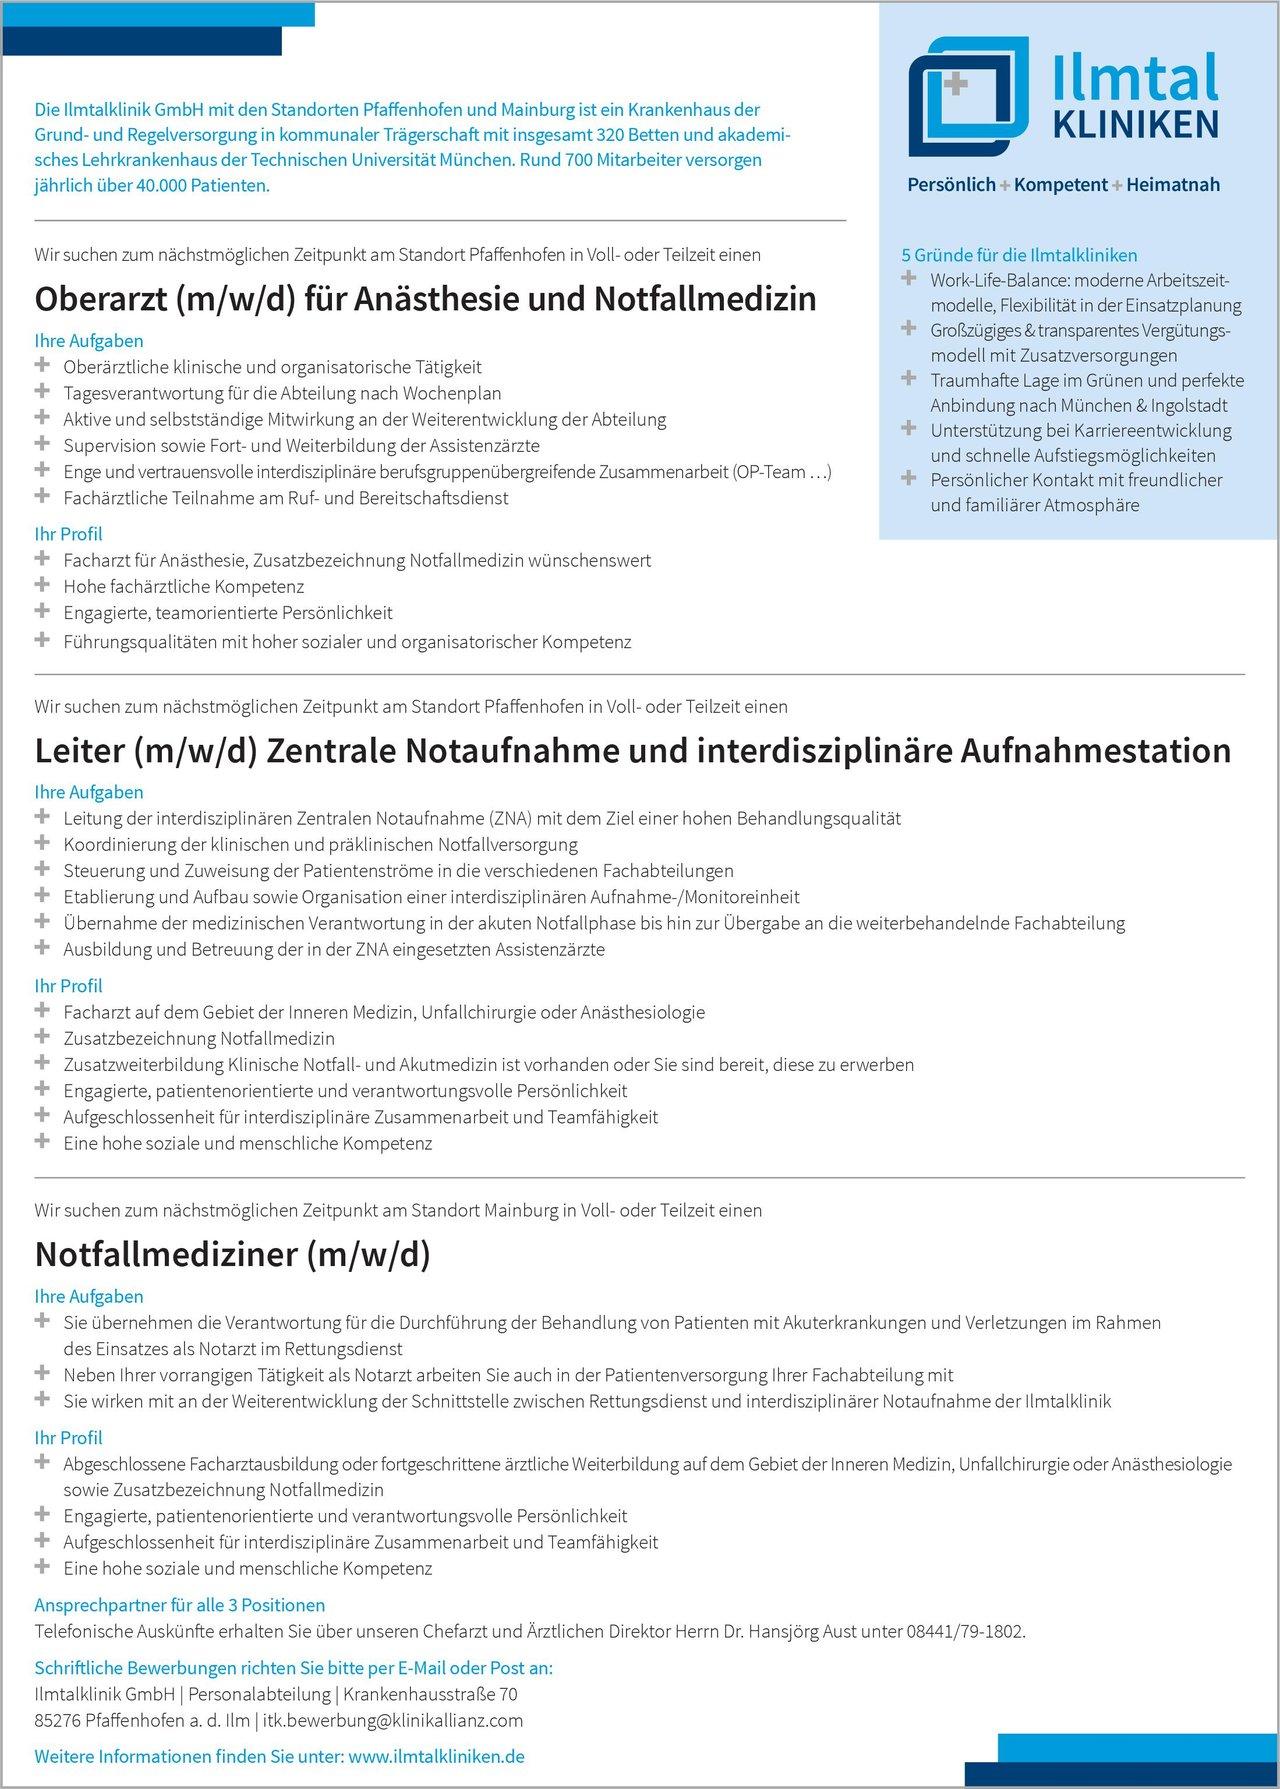 Ilmtal Kliniken Notfallmediziner (m/w/d) Notfallmedizin Arzt / Facharzt